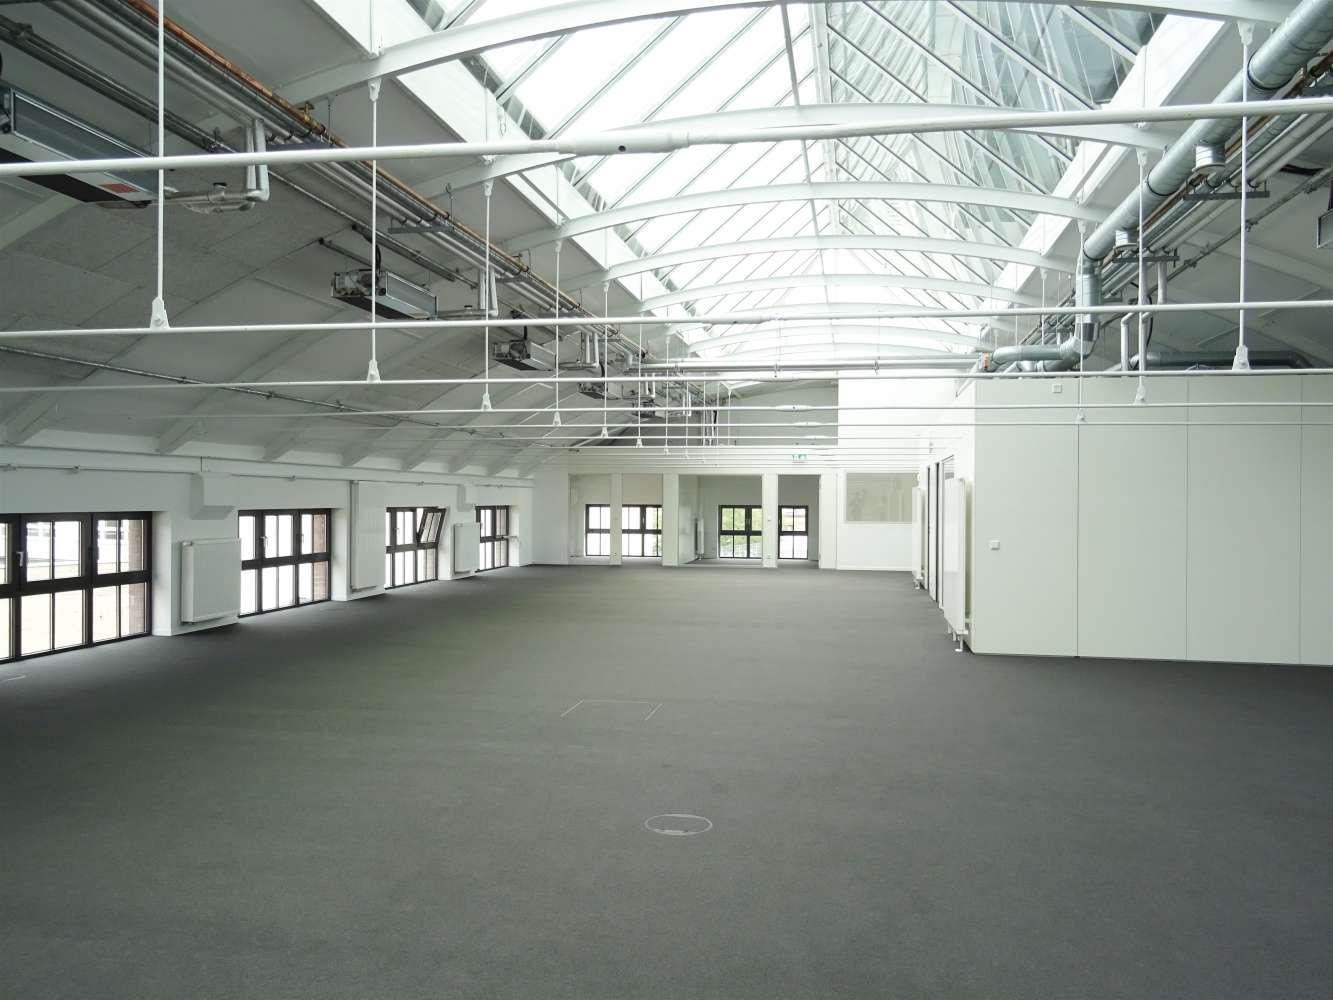 Büros Rüsselsheim, 65428 - Büro - Rüsselsheim - F2501 - 9621579